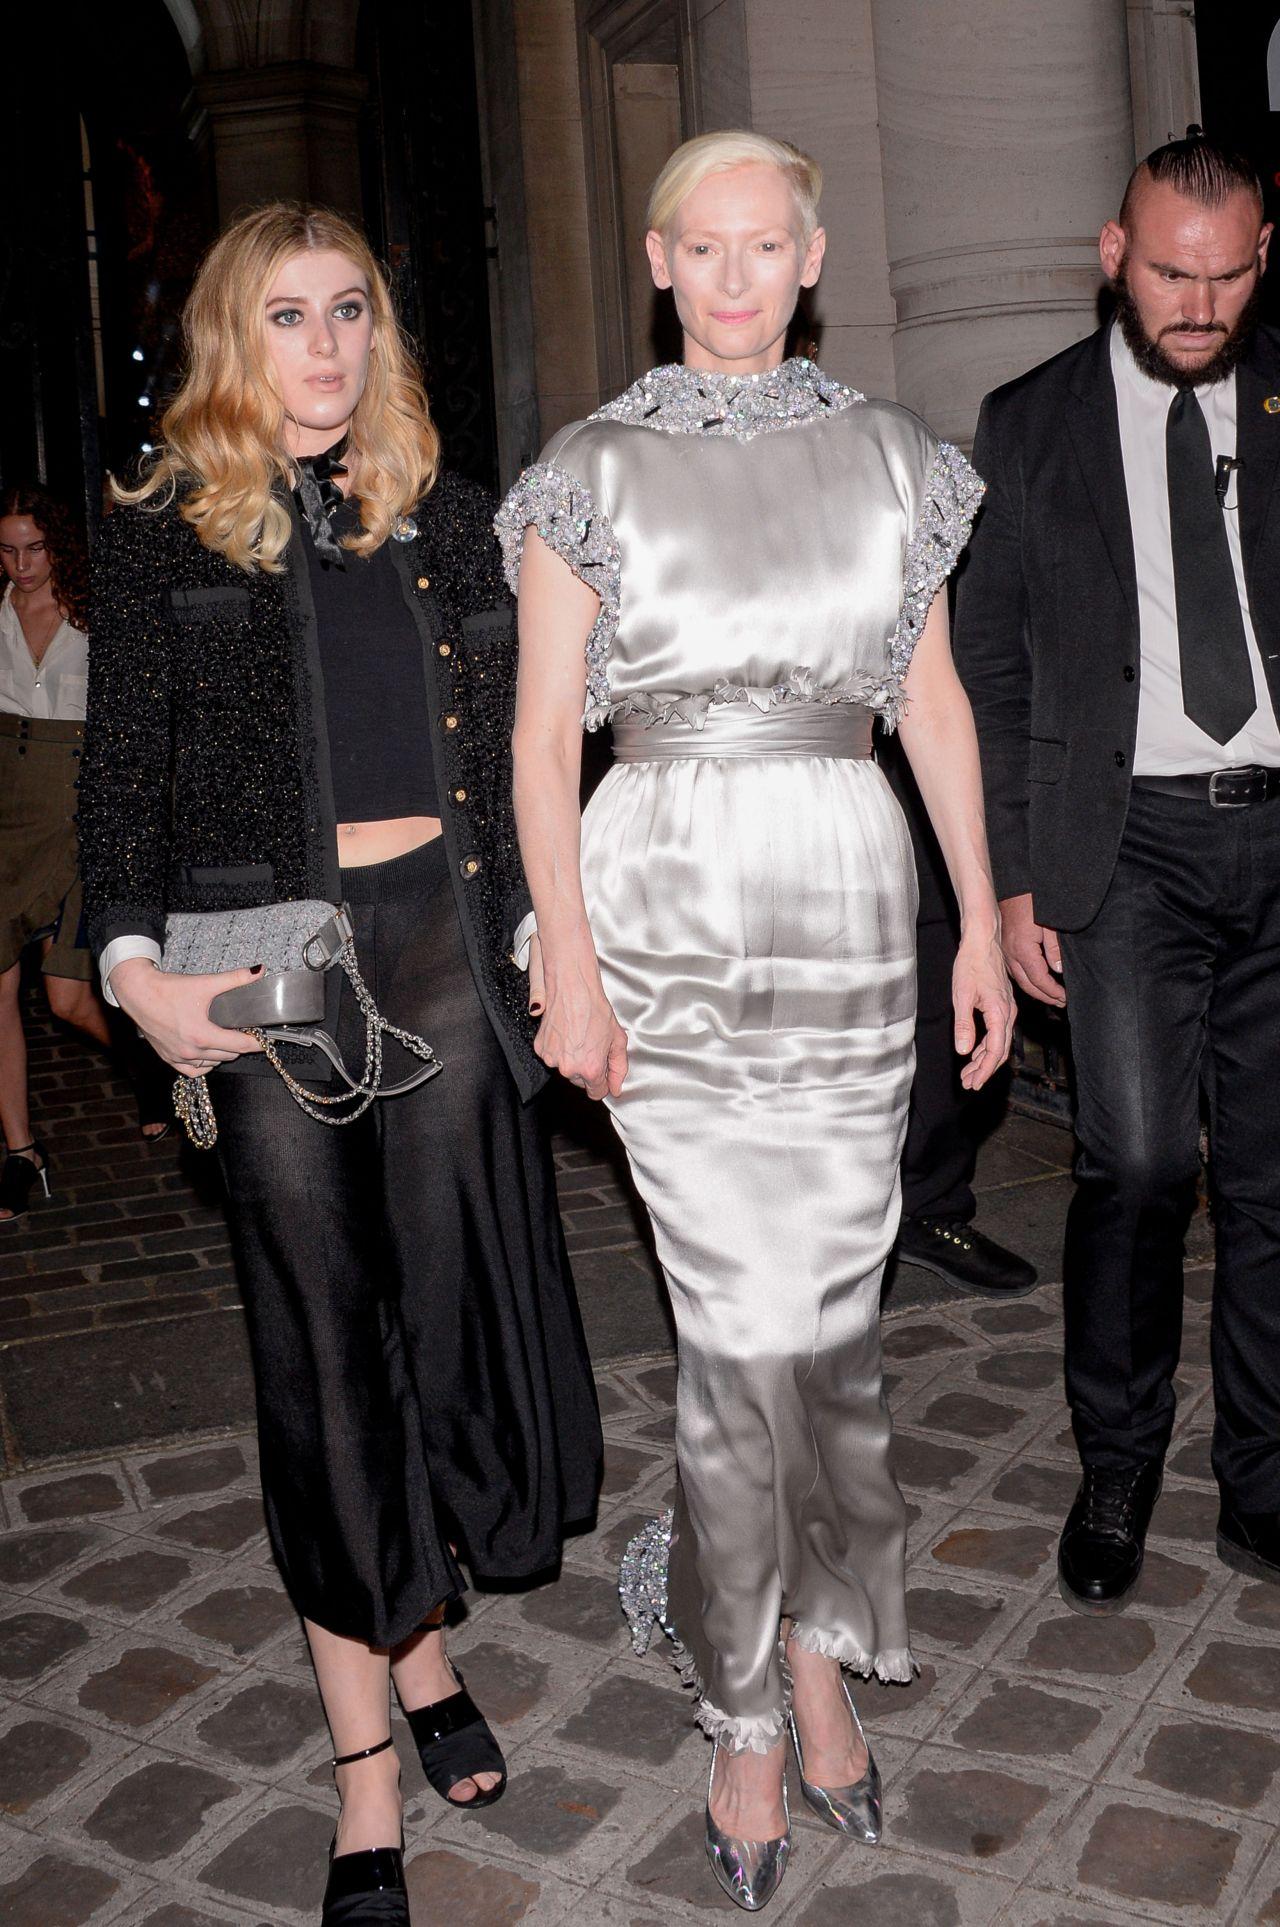 Tilda Swinton Vogue Party At Paris Fashion Week 07 04 2017